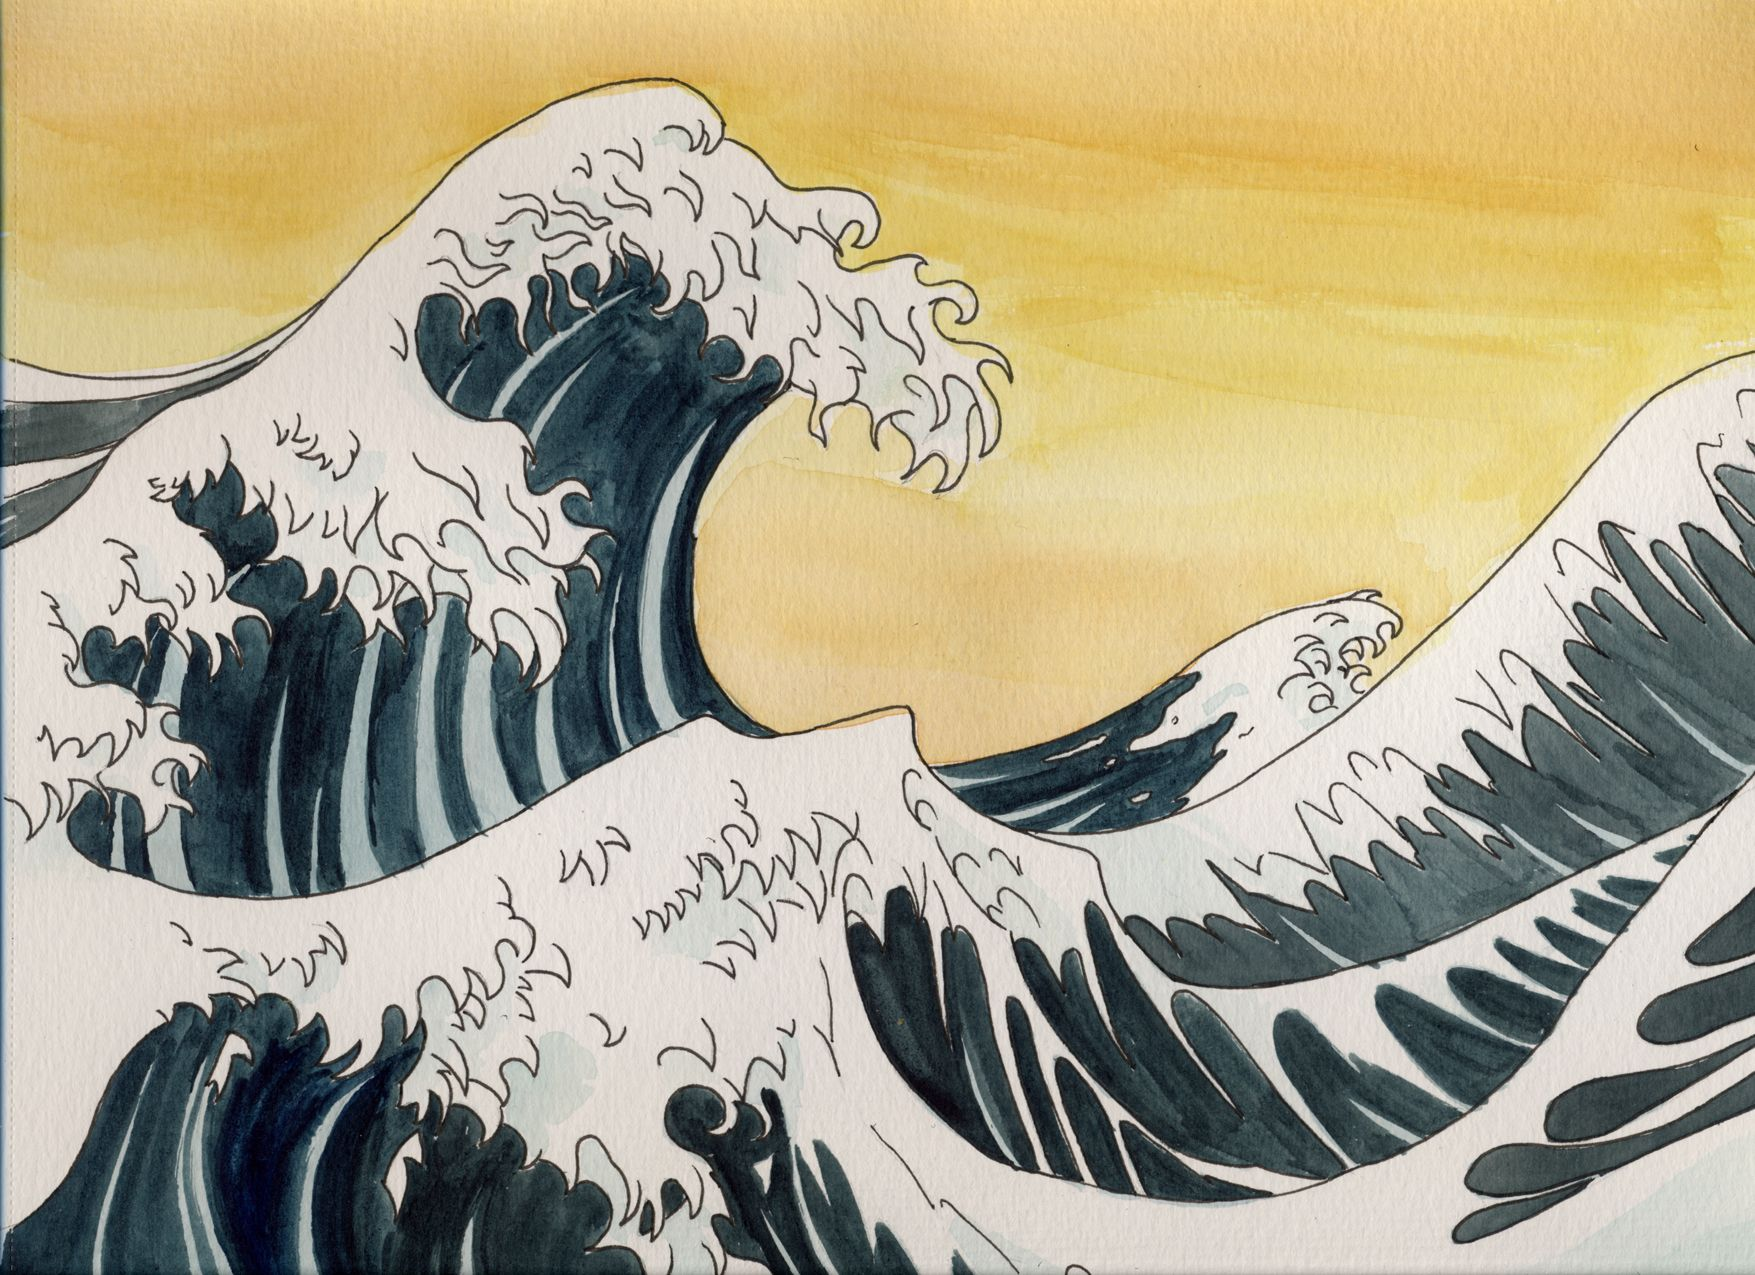 pinkamil kedzierski on art   pinterest   tokyo